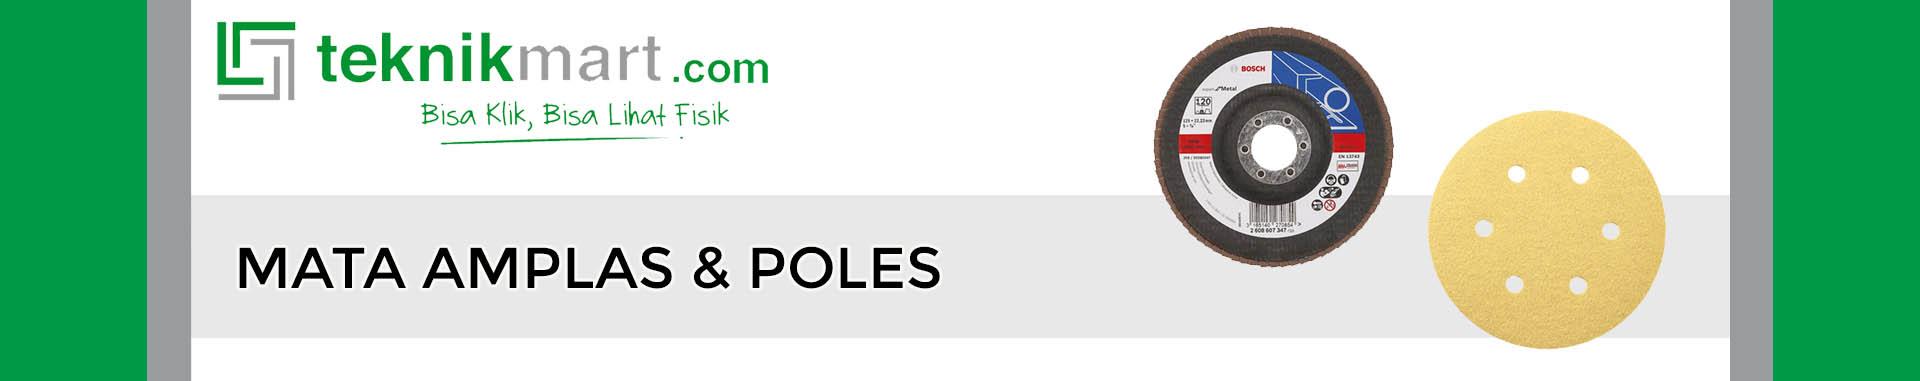 Mata Amplas & Poles